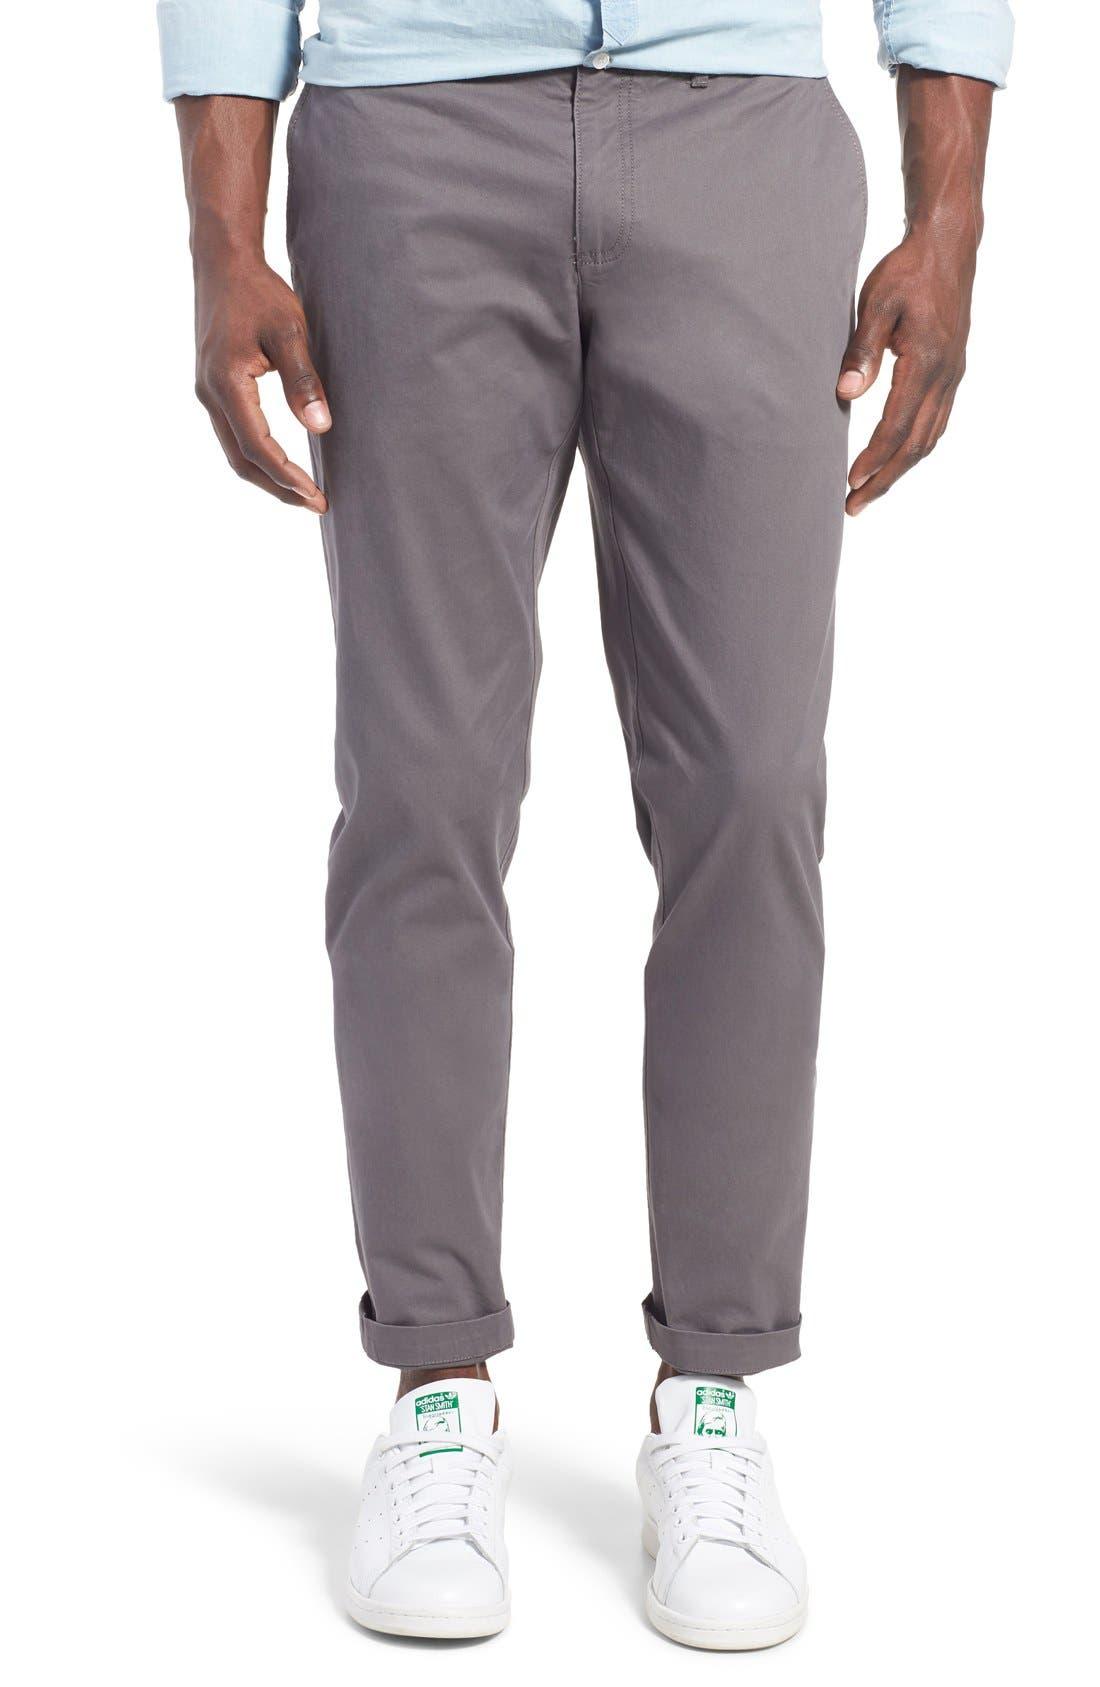 'P55' Slim Fit Stretch Cotton Chinos,                         Main,                         color, Castlerock